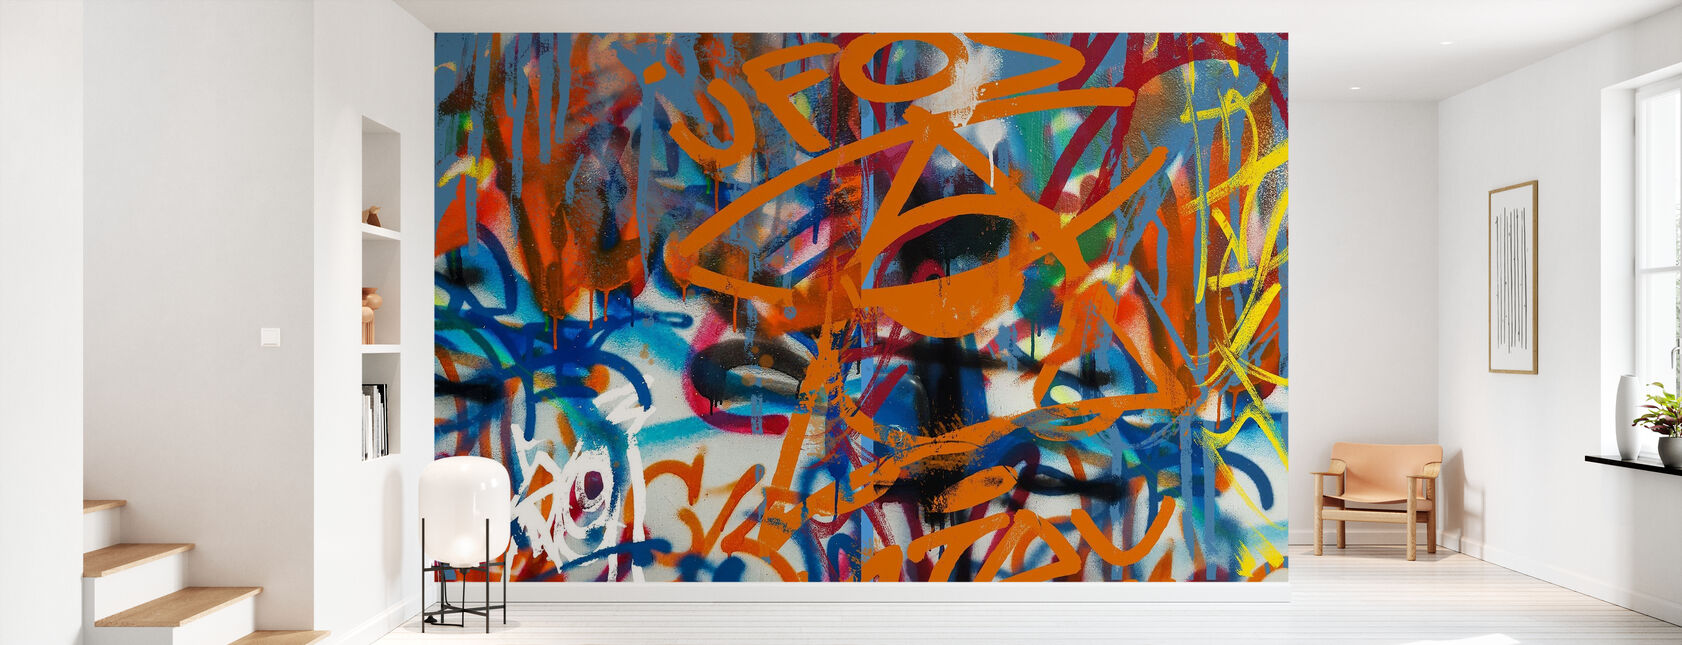 Graffiti Abstract Art - Wallpaper - Hallway